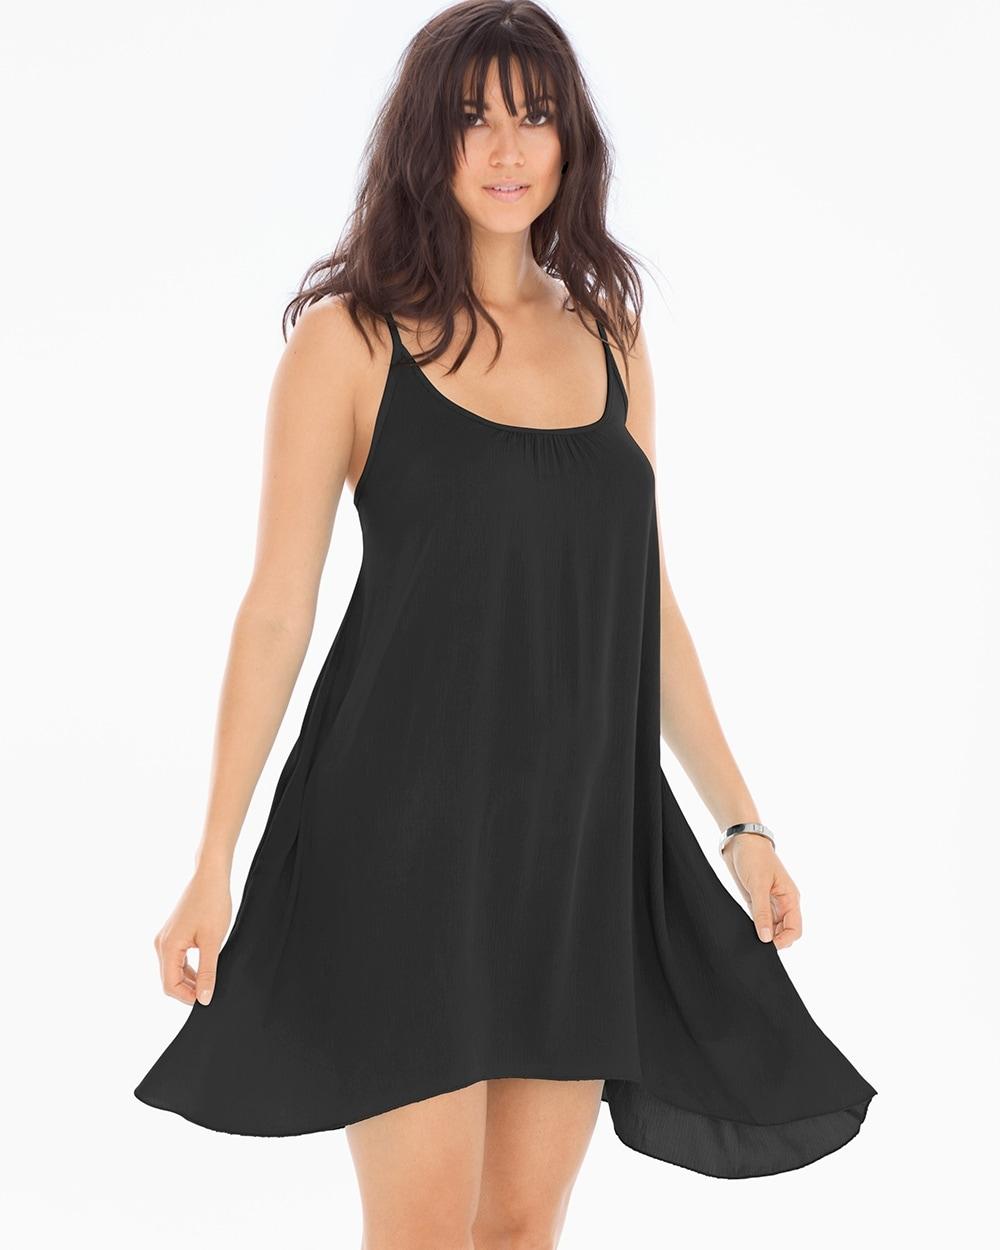 05903f204d Spaghetti Strap Cover Up Dress - Soma